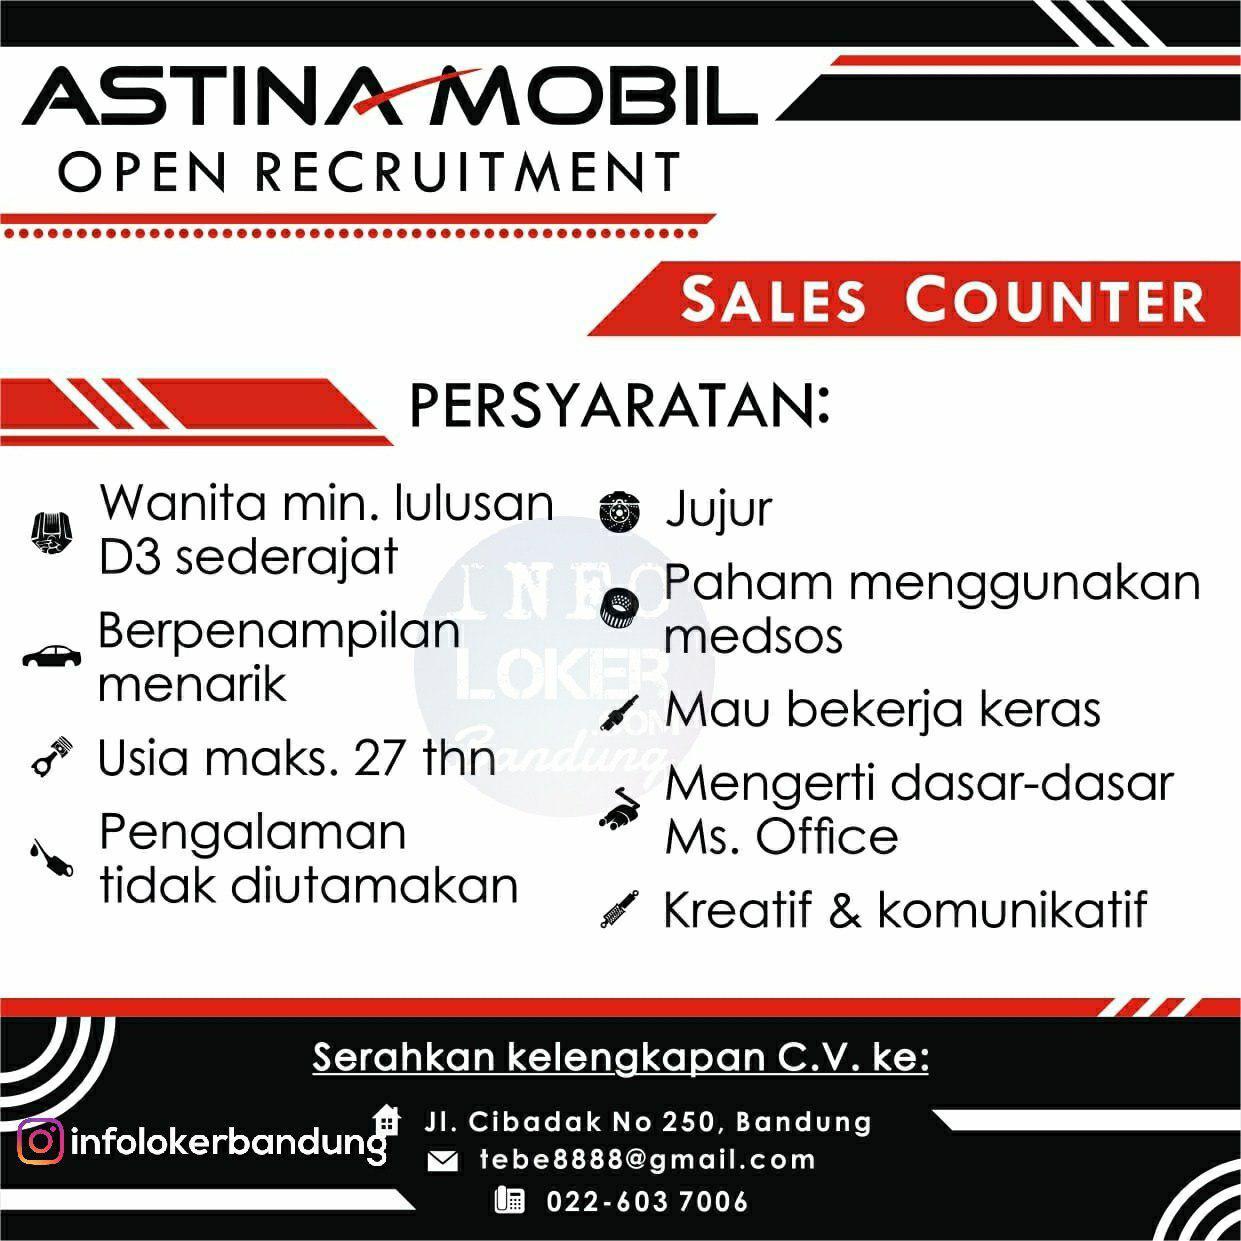 Lowongan Kerja Astina Mobil Bandung Oktober 2018